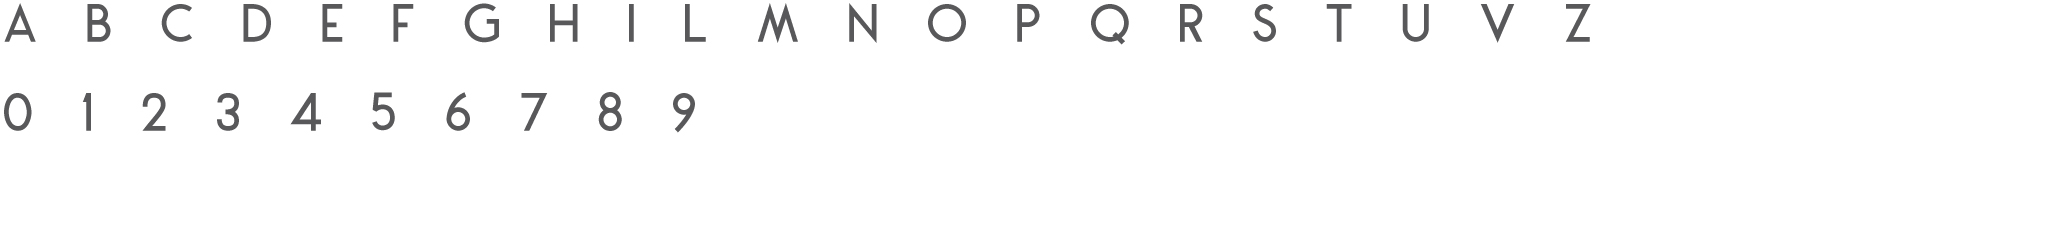 font logo azienda agricola al fusaio